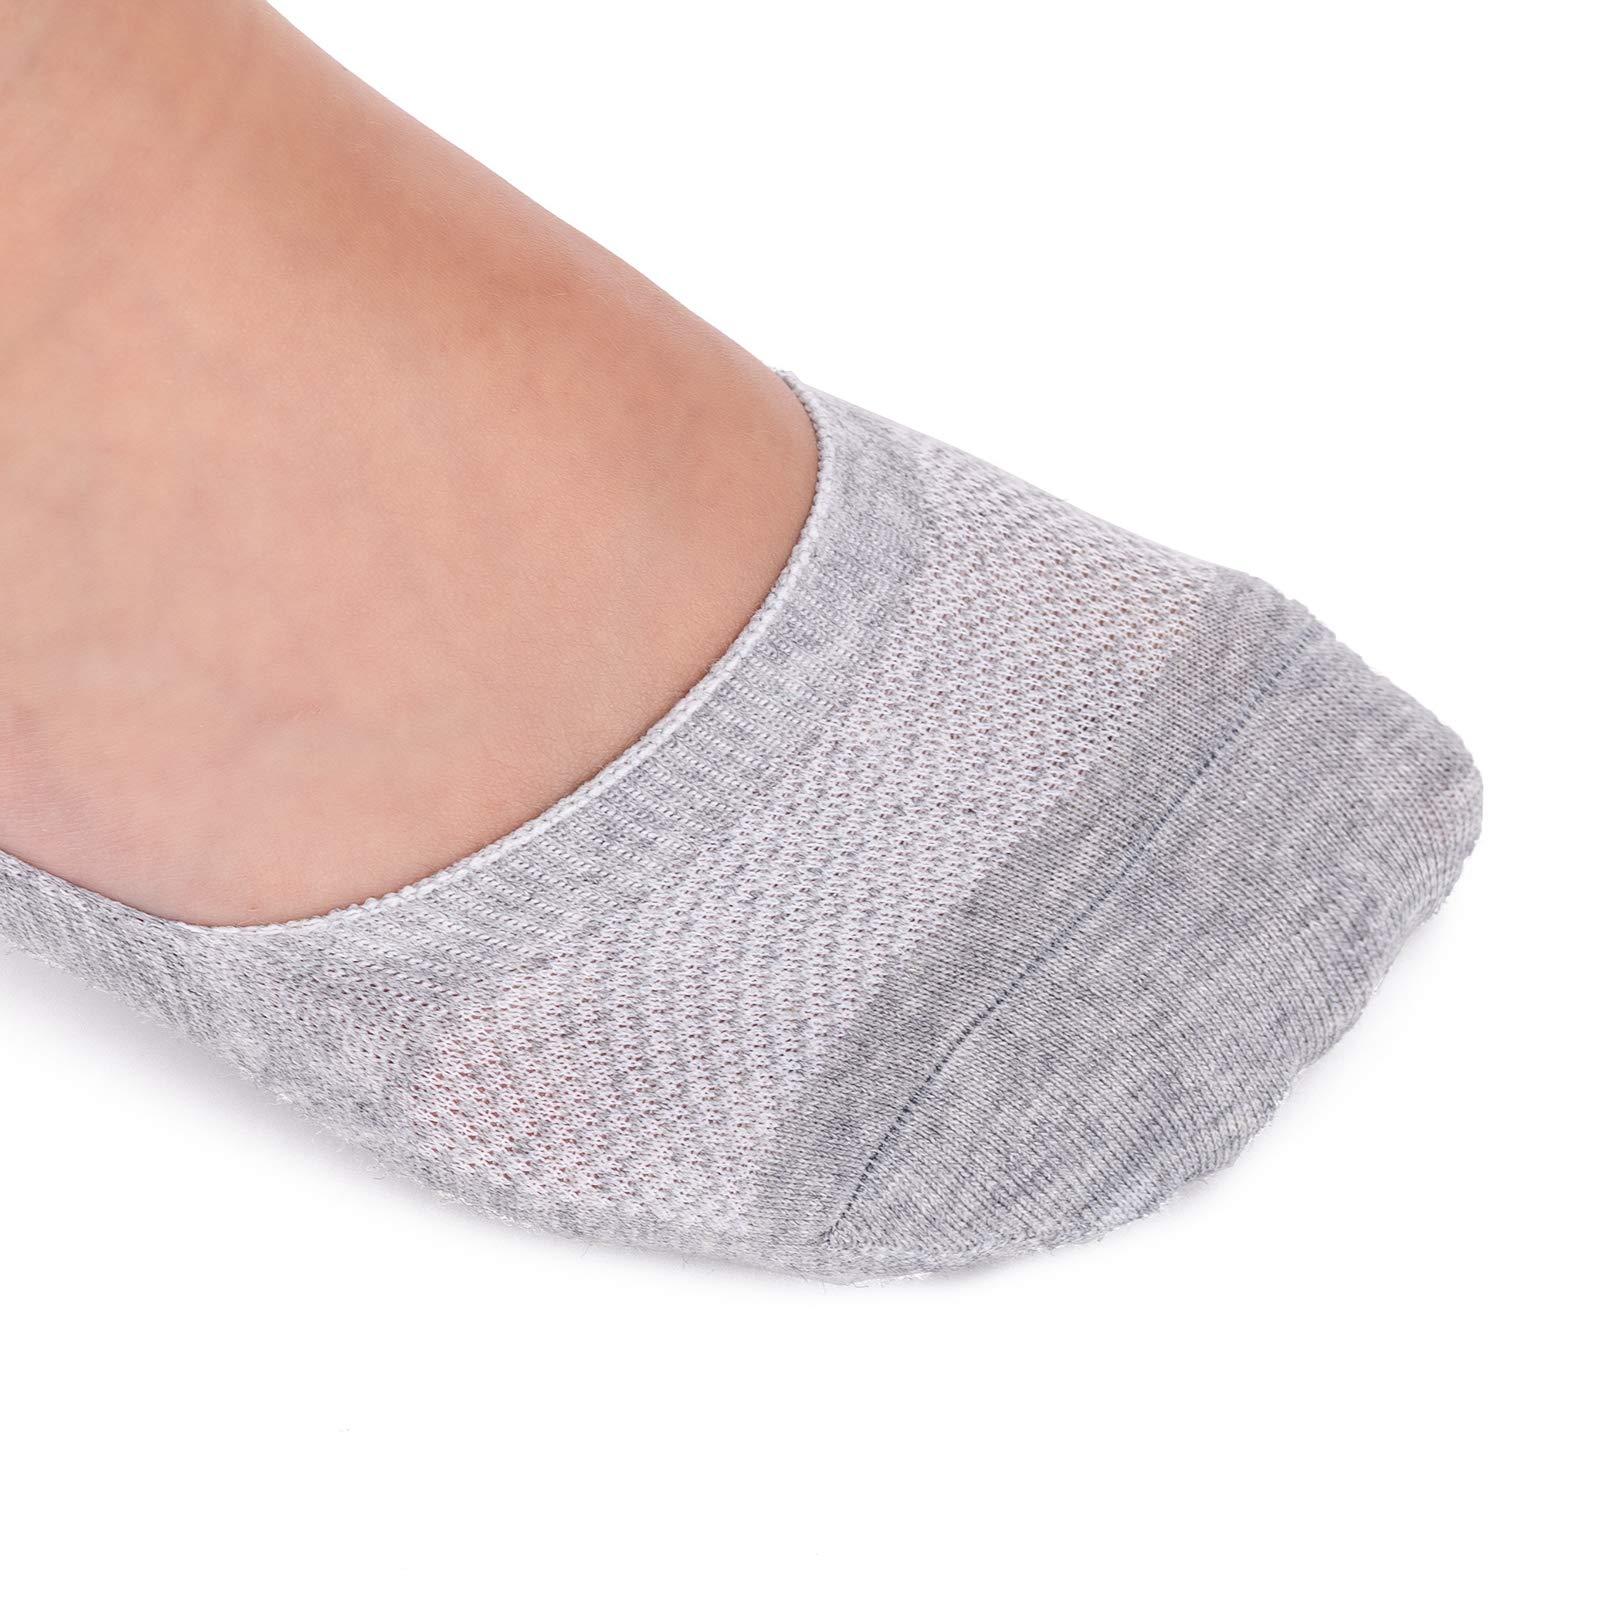 Women Anti-Slip Colorful Striped Low-Cut Footsies Trainer Shoe Liner Socks  CW22